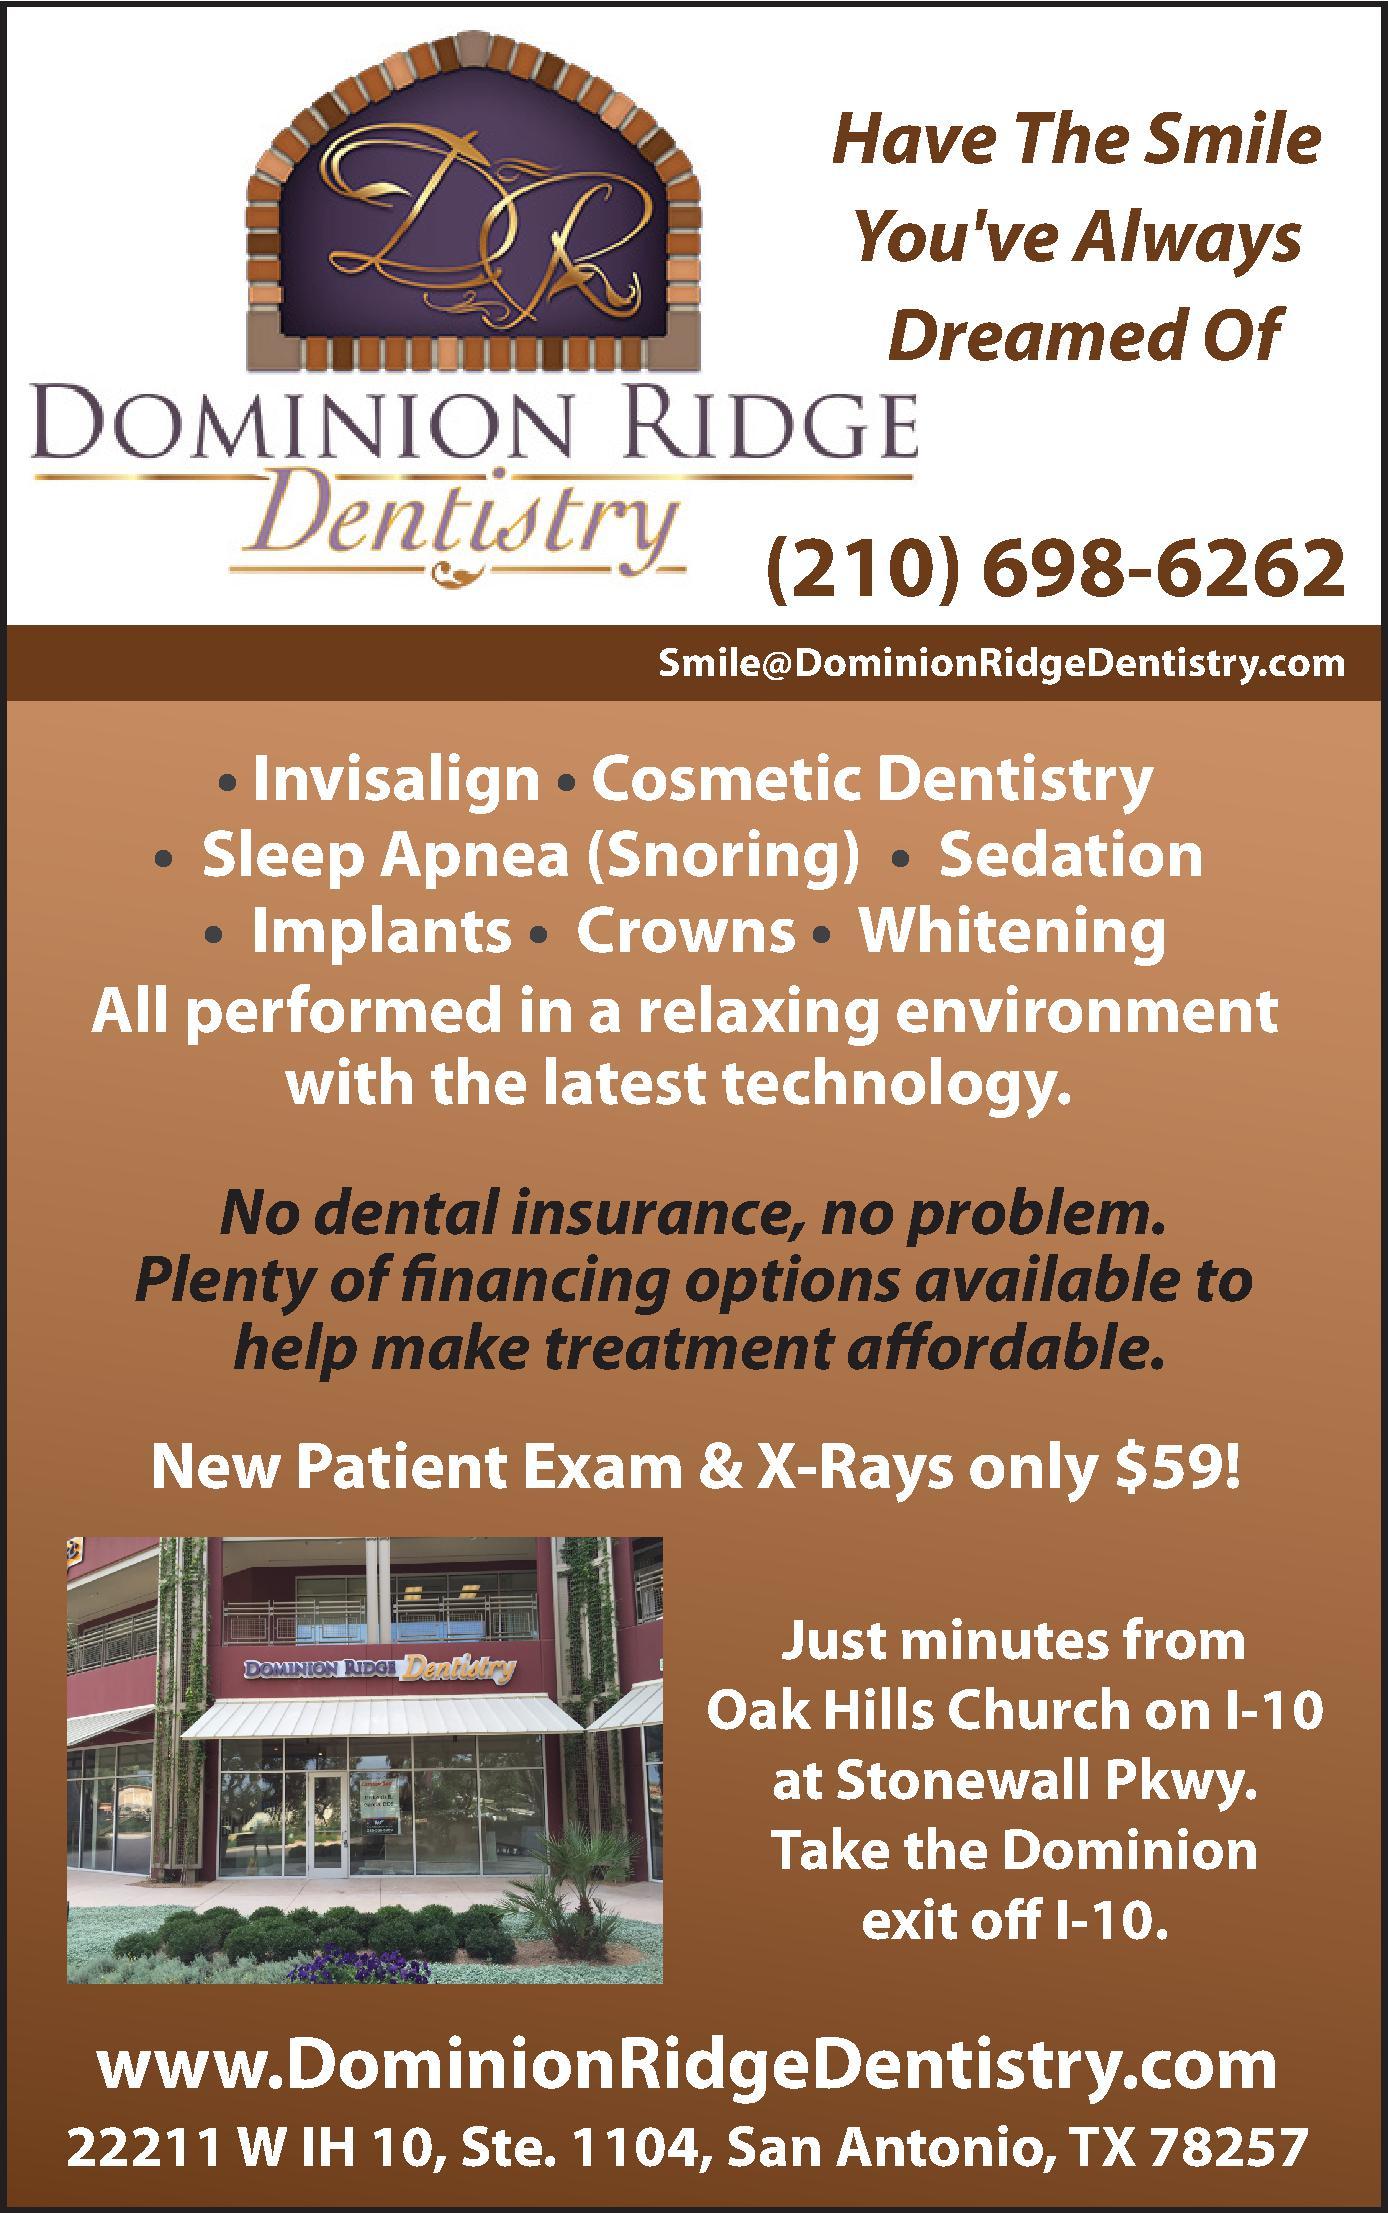 Dominion Ridge Dentistry